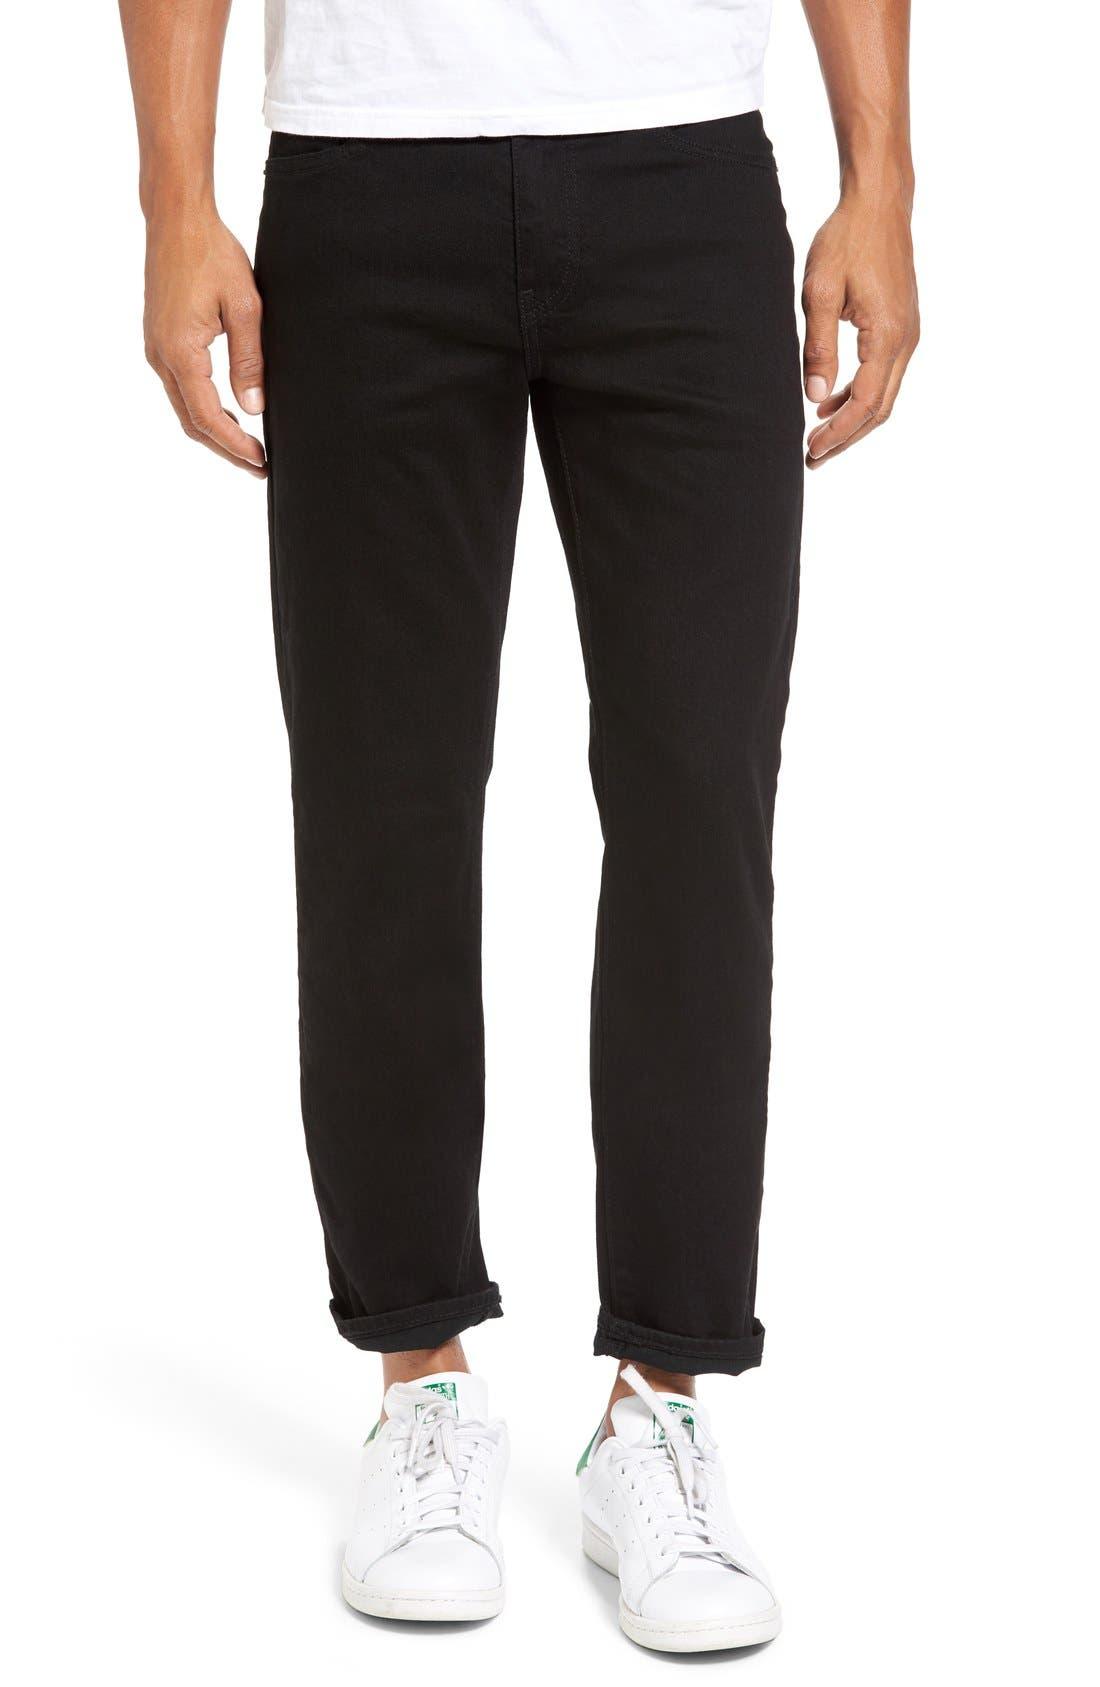 Main Image - Levi's® 511™ Slim Fit Jeans (Nightshine) (Regular & Tall)